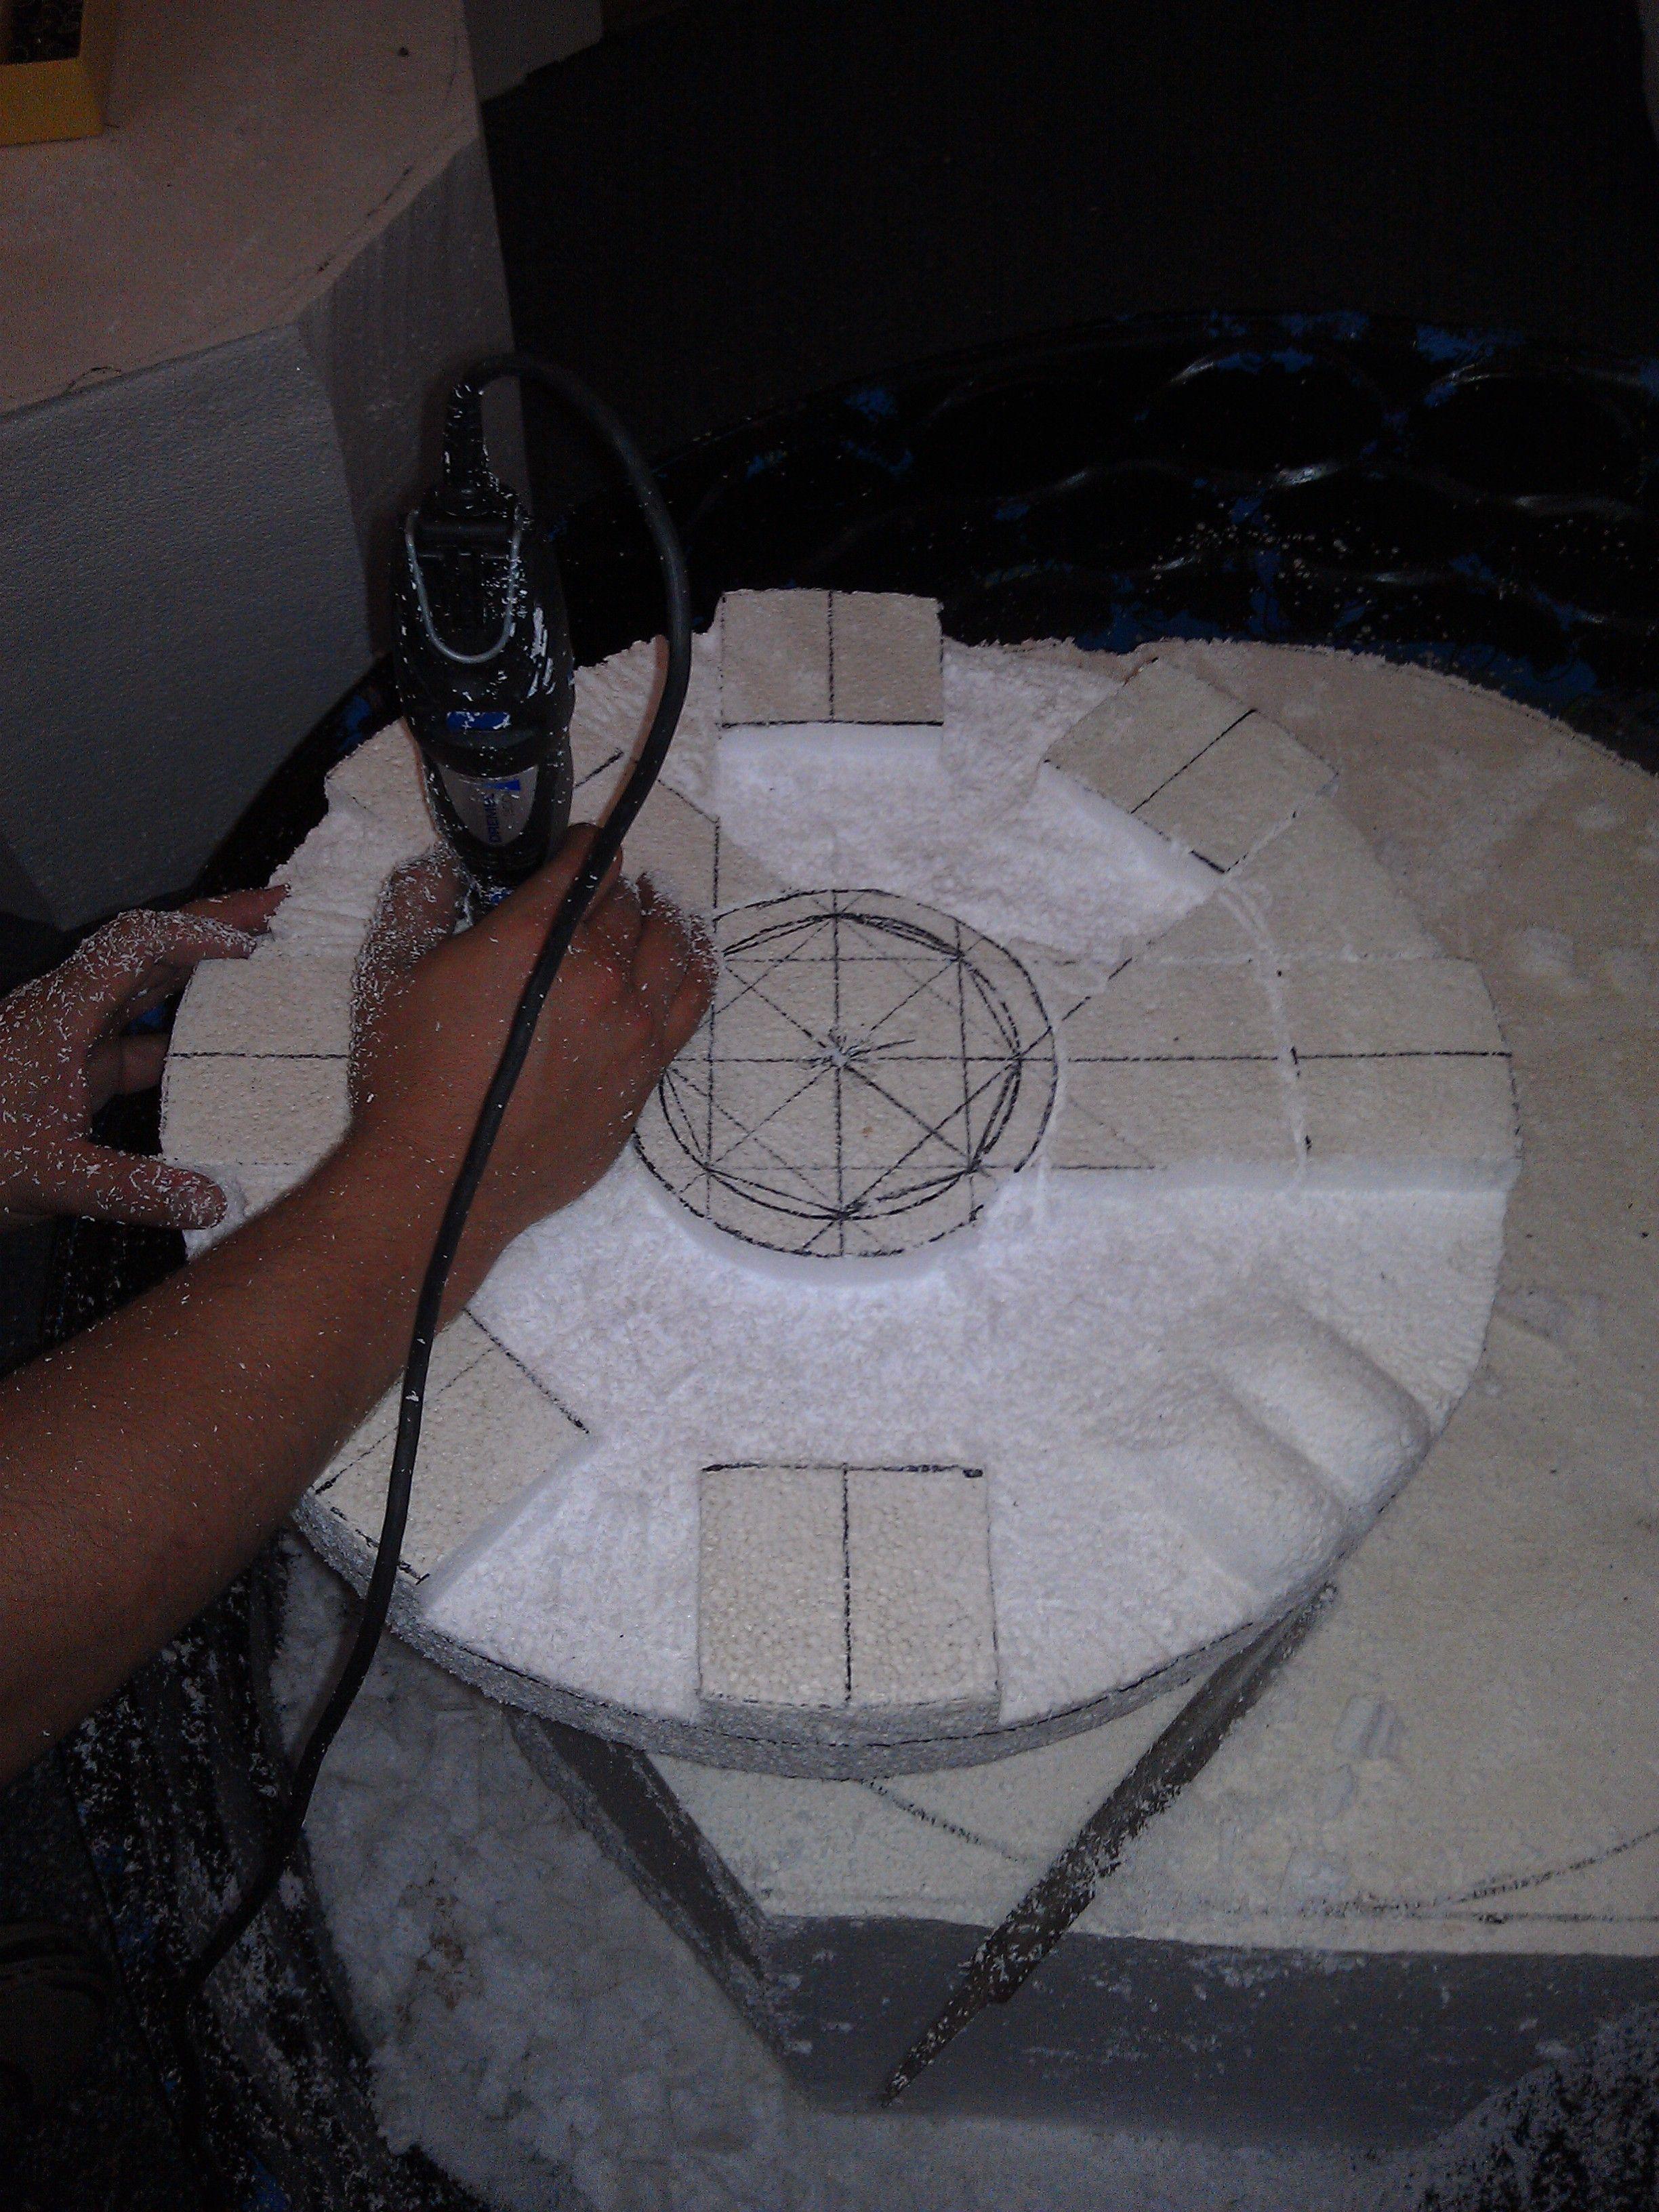 Carving the foam 3 tier fountain prop making foam props